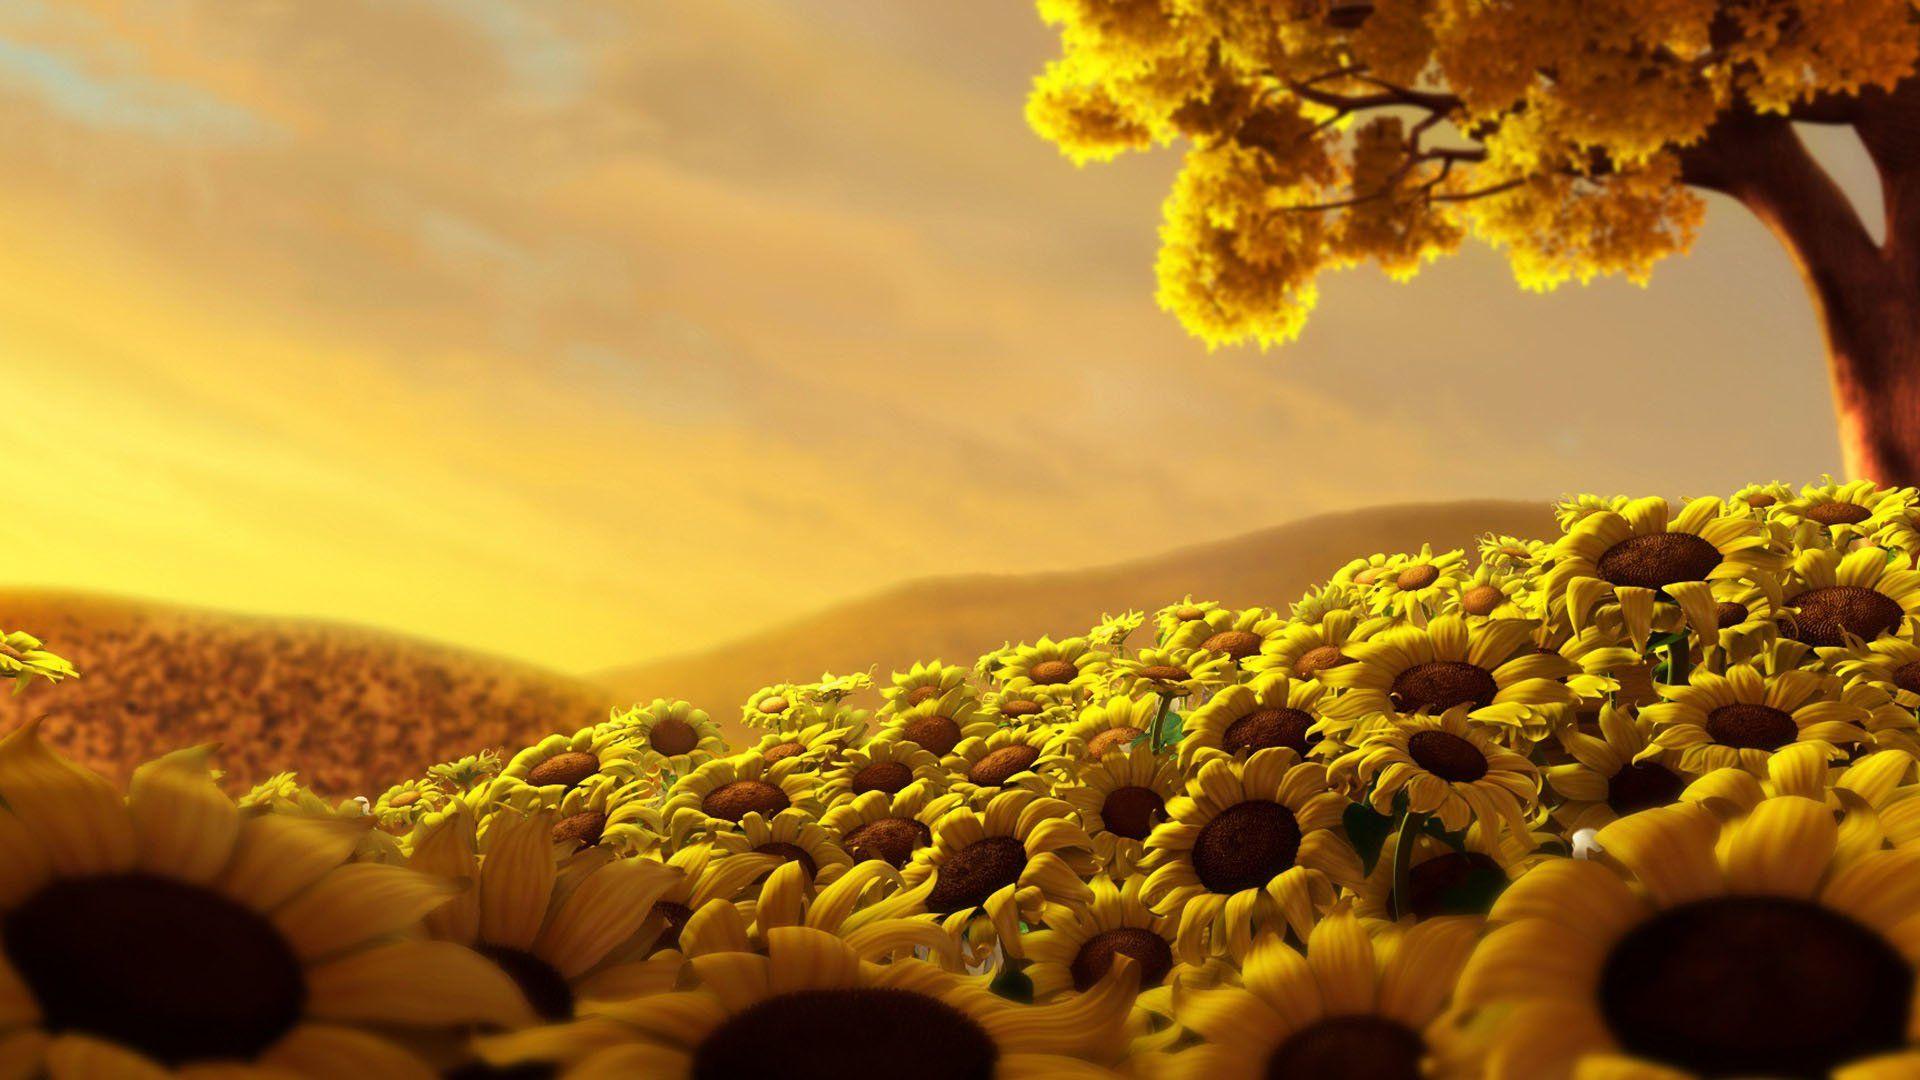 sunflower phone background